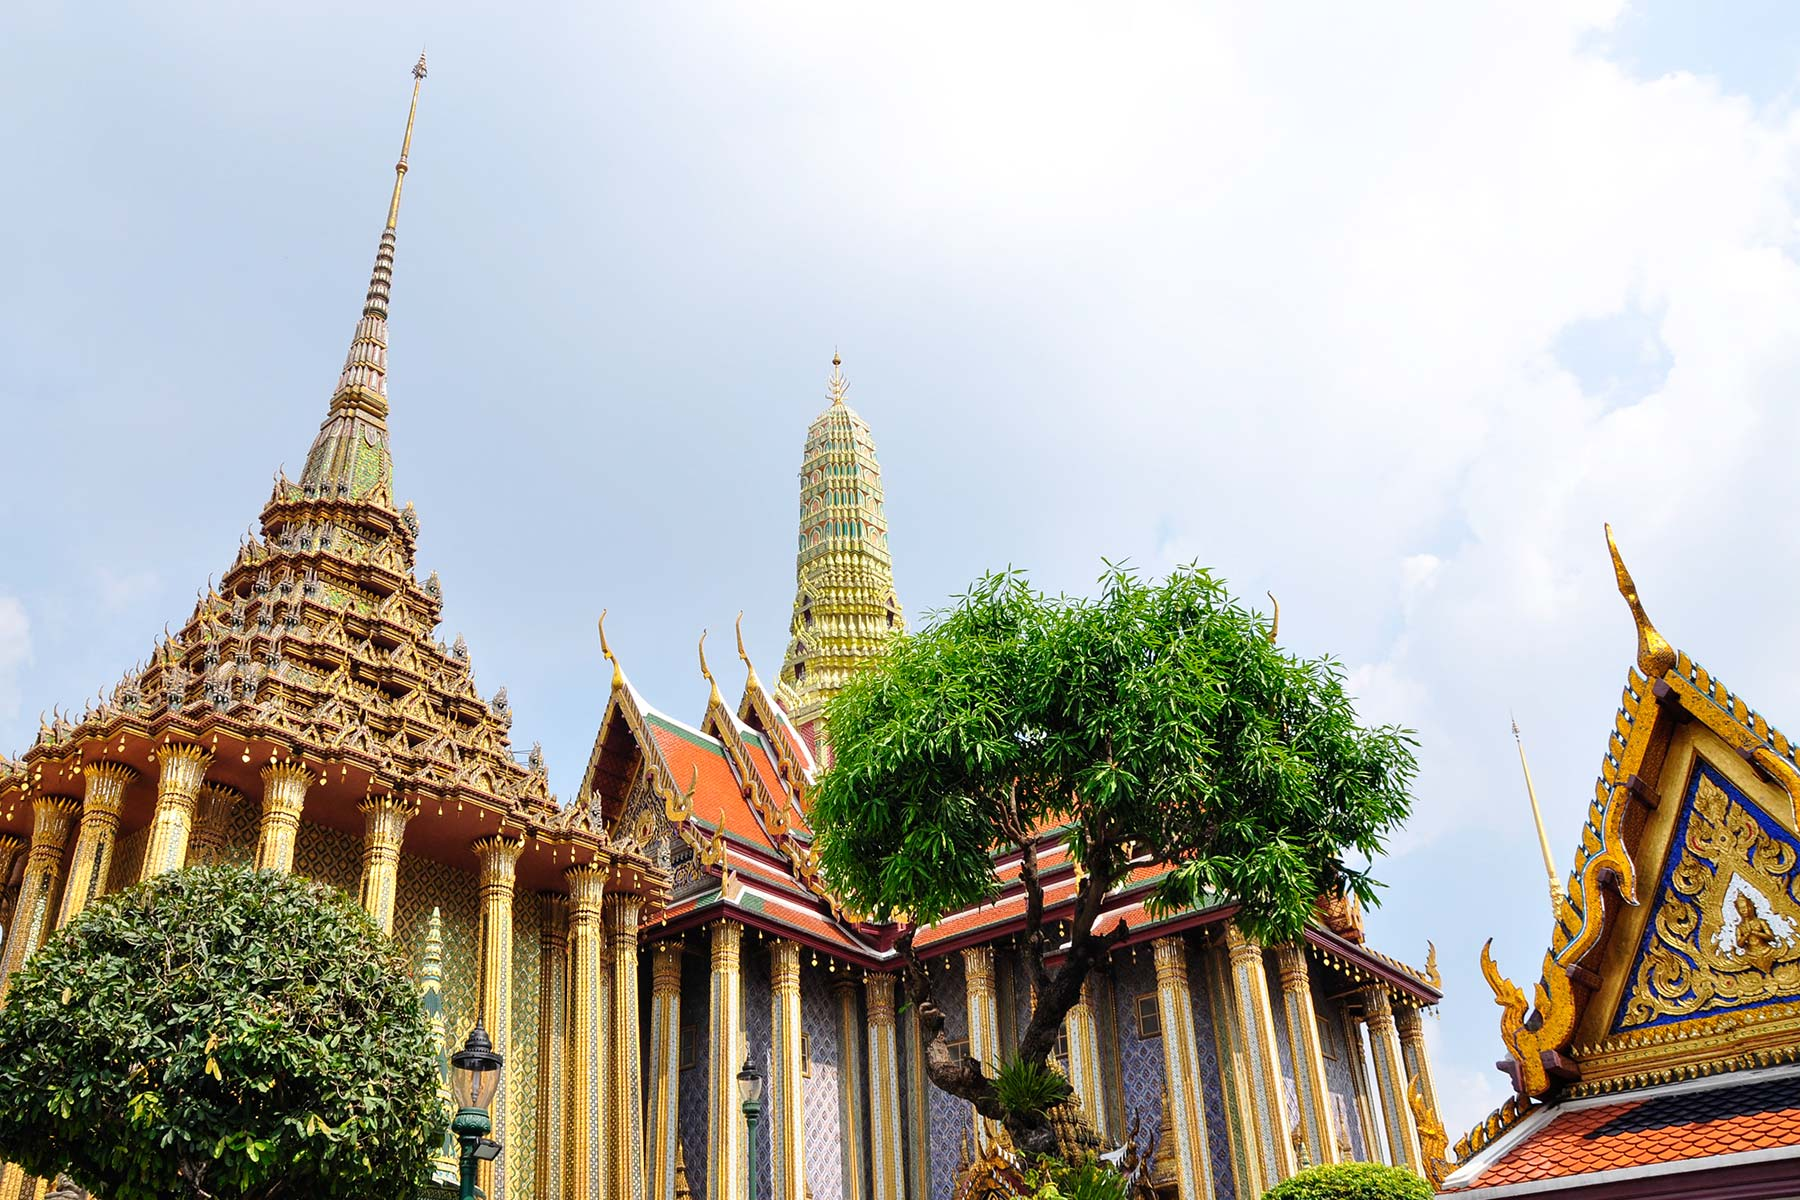 Wat Phra Kaew & Grand Palace in Bangkok, Thailand